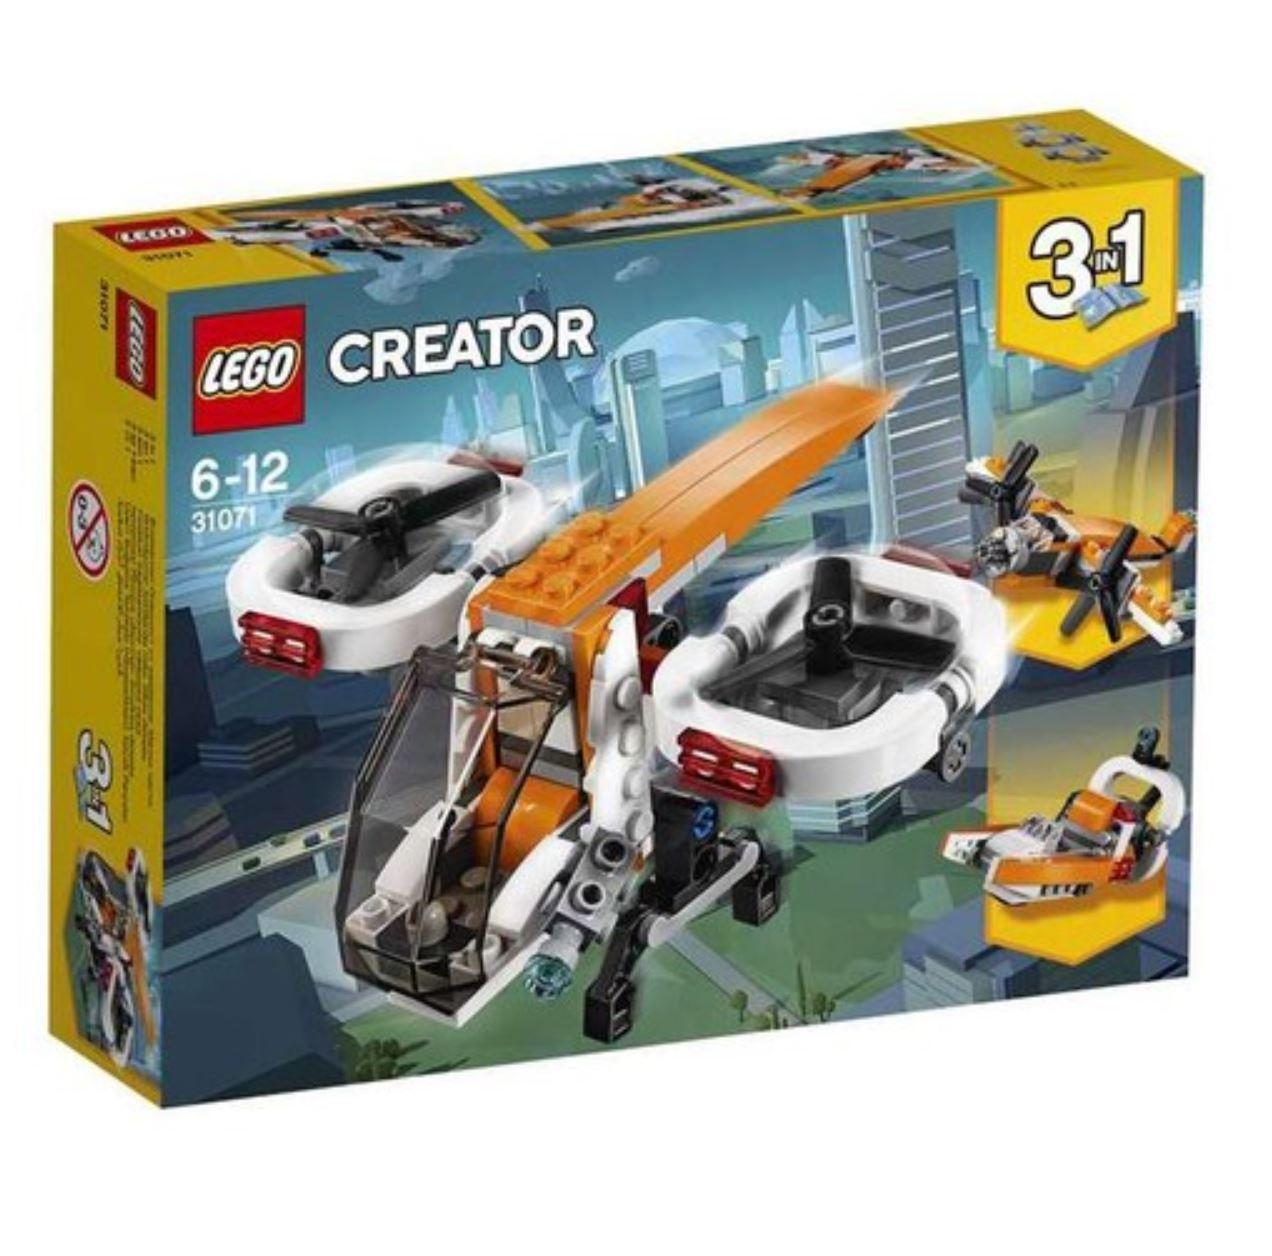 [LEGO] CREATOR Drone Explorer Explorer Explorer 31071 2018 Version Free Shipping c63d53